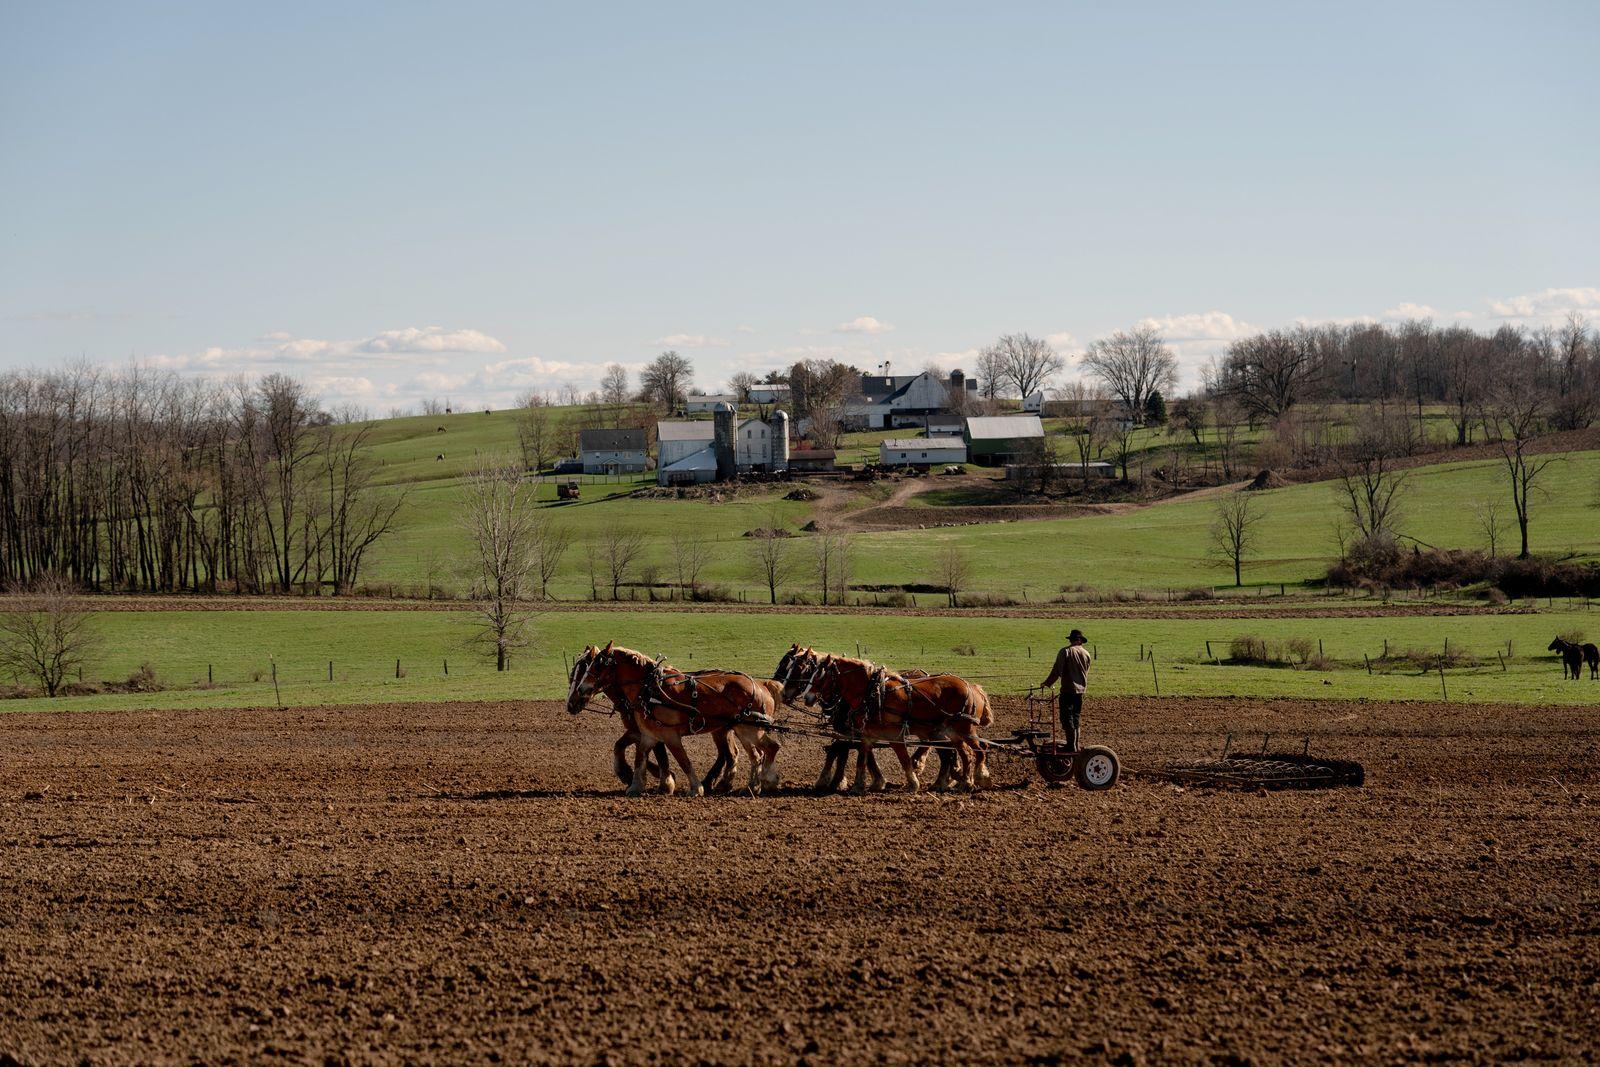 An Amish man plows a field in Fredericksburg, Ohio, April 2, 2020. (Erin Schaff/The New York Times)